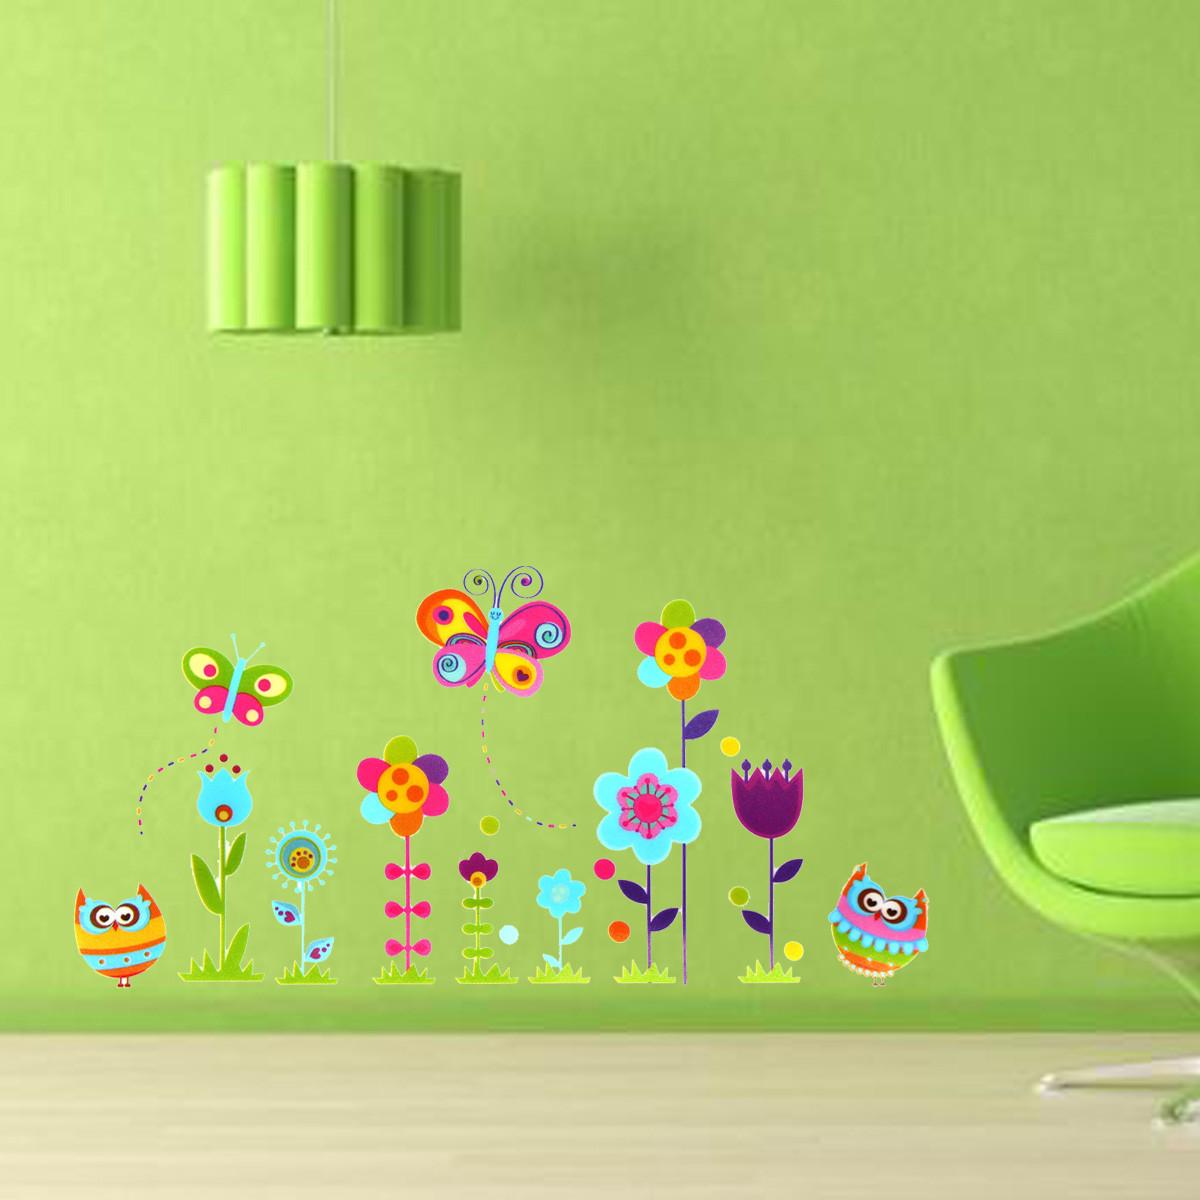 Kids Room Decor Owl Butterfly Flower Nursery Diy Removable